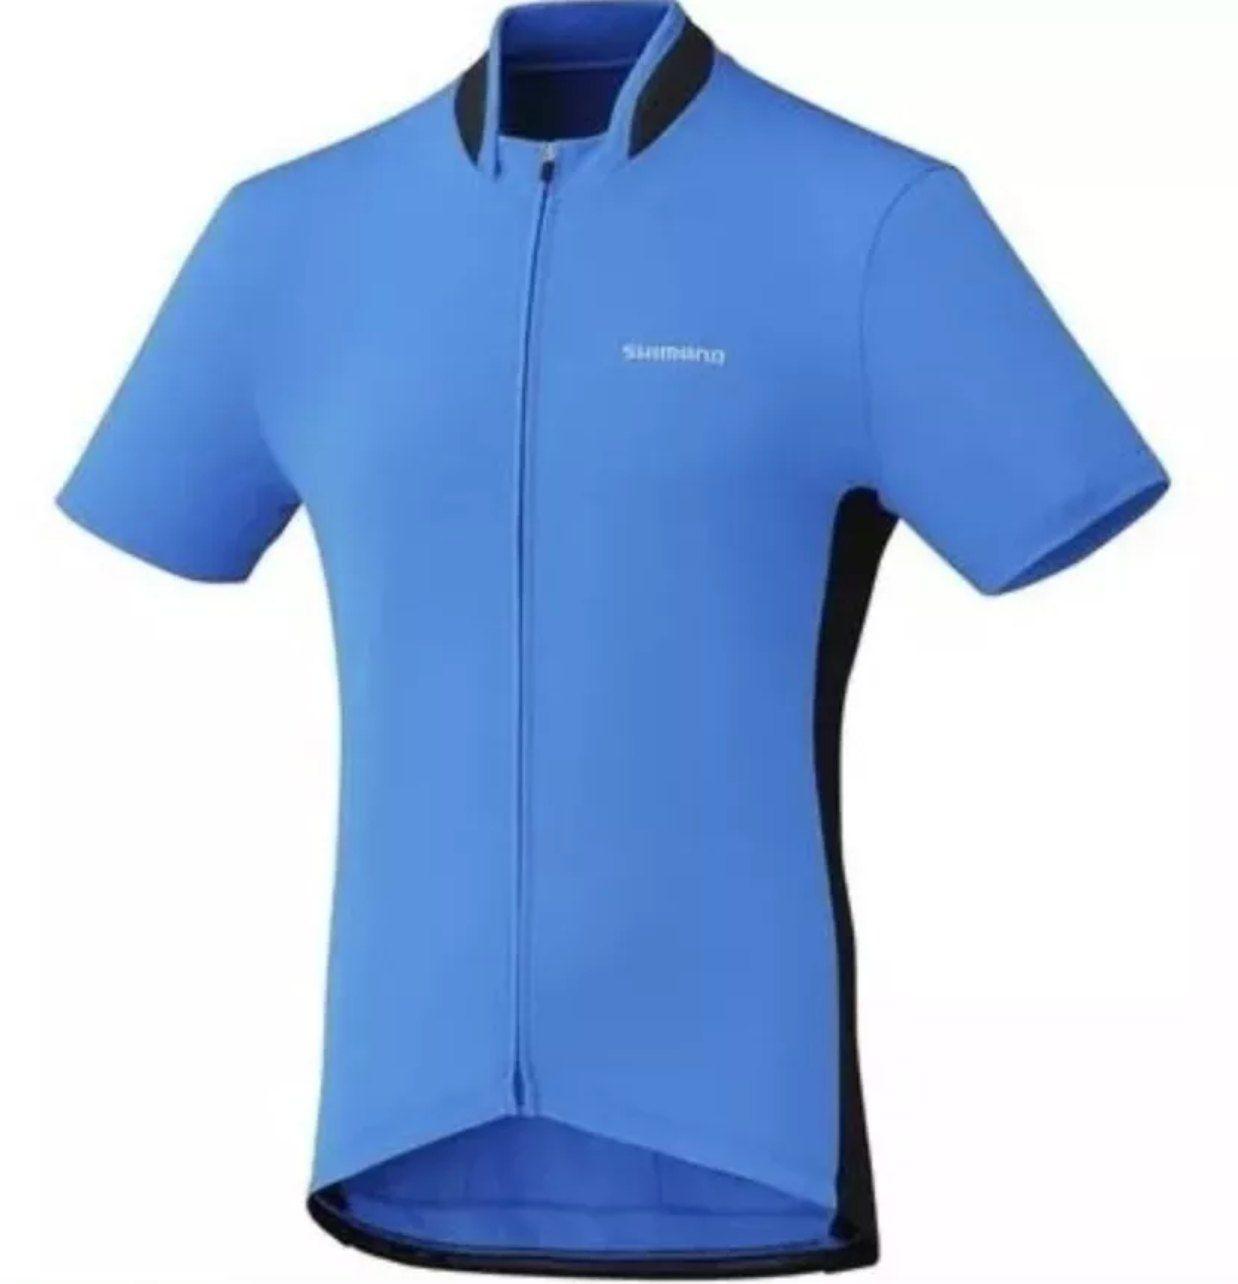 Camisa Ciclismo Shimano Performance Full Zip Azul Tam P